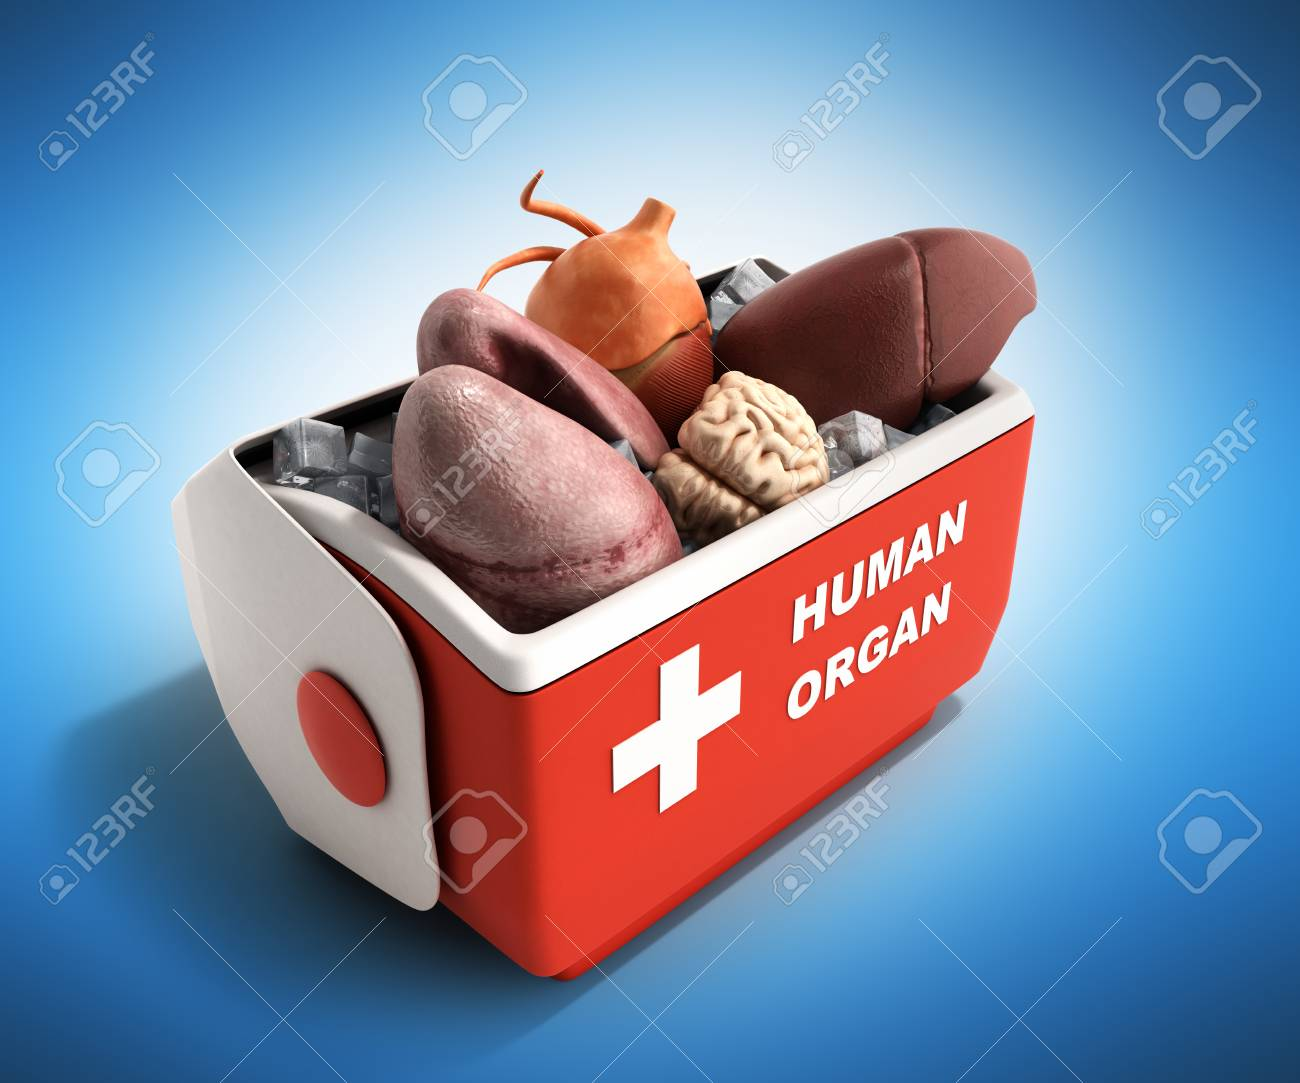 Kühlschrank Box : Organ transport konzept öffnen menschlichen organ kühlschrank box